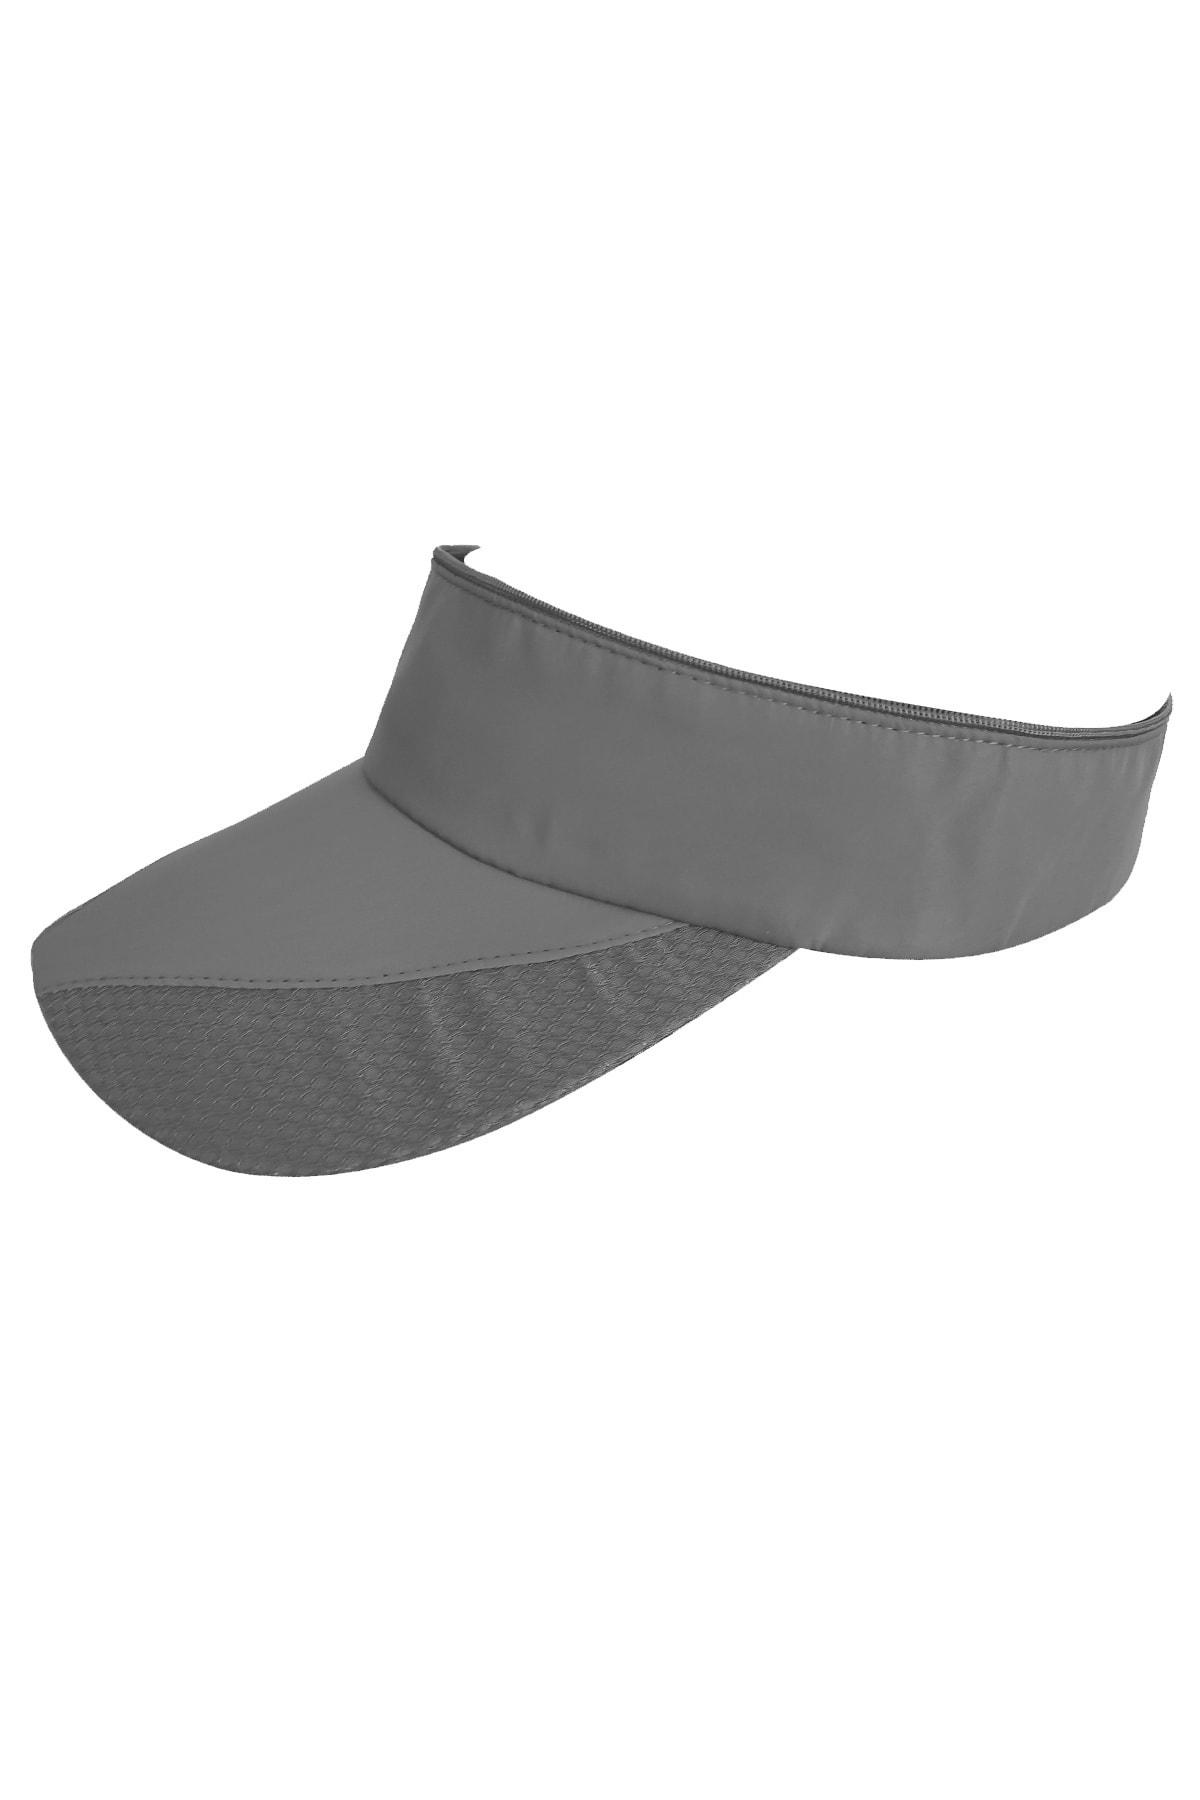 Sporcu Koşu Tenis Şapkası Koyu Gri Vizör Şapka